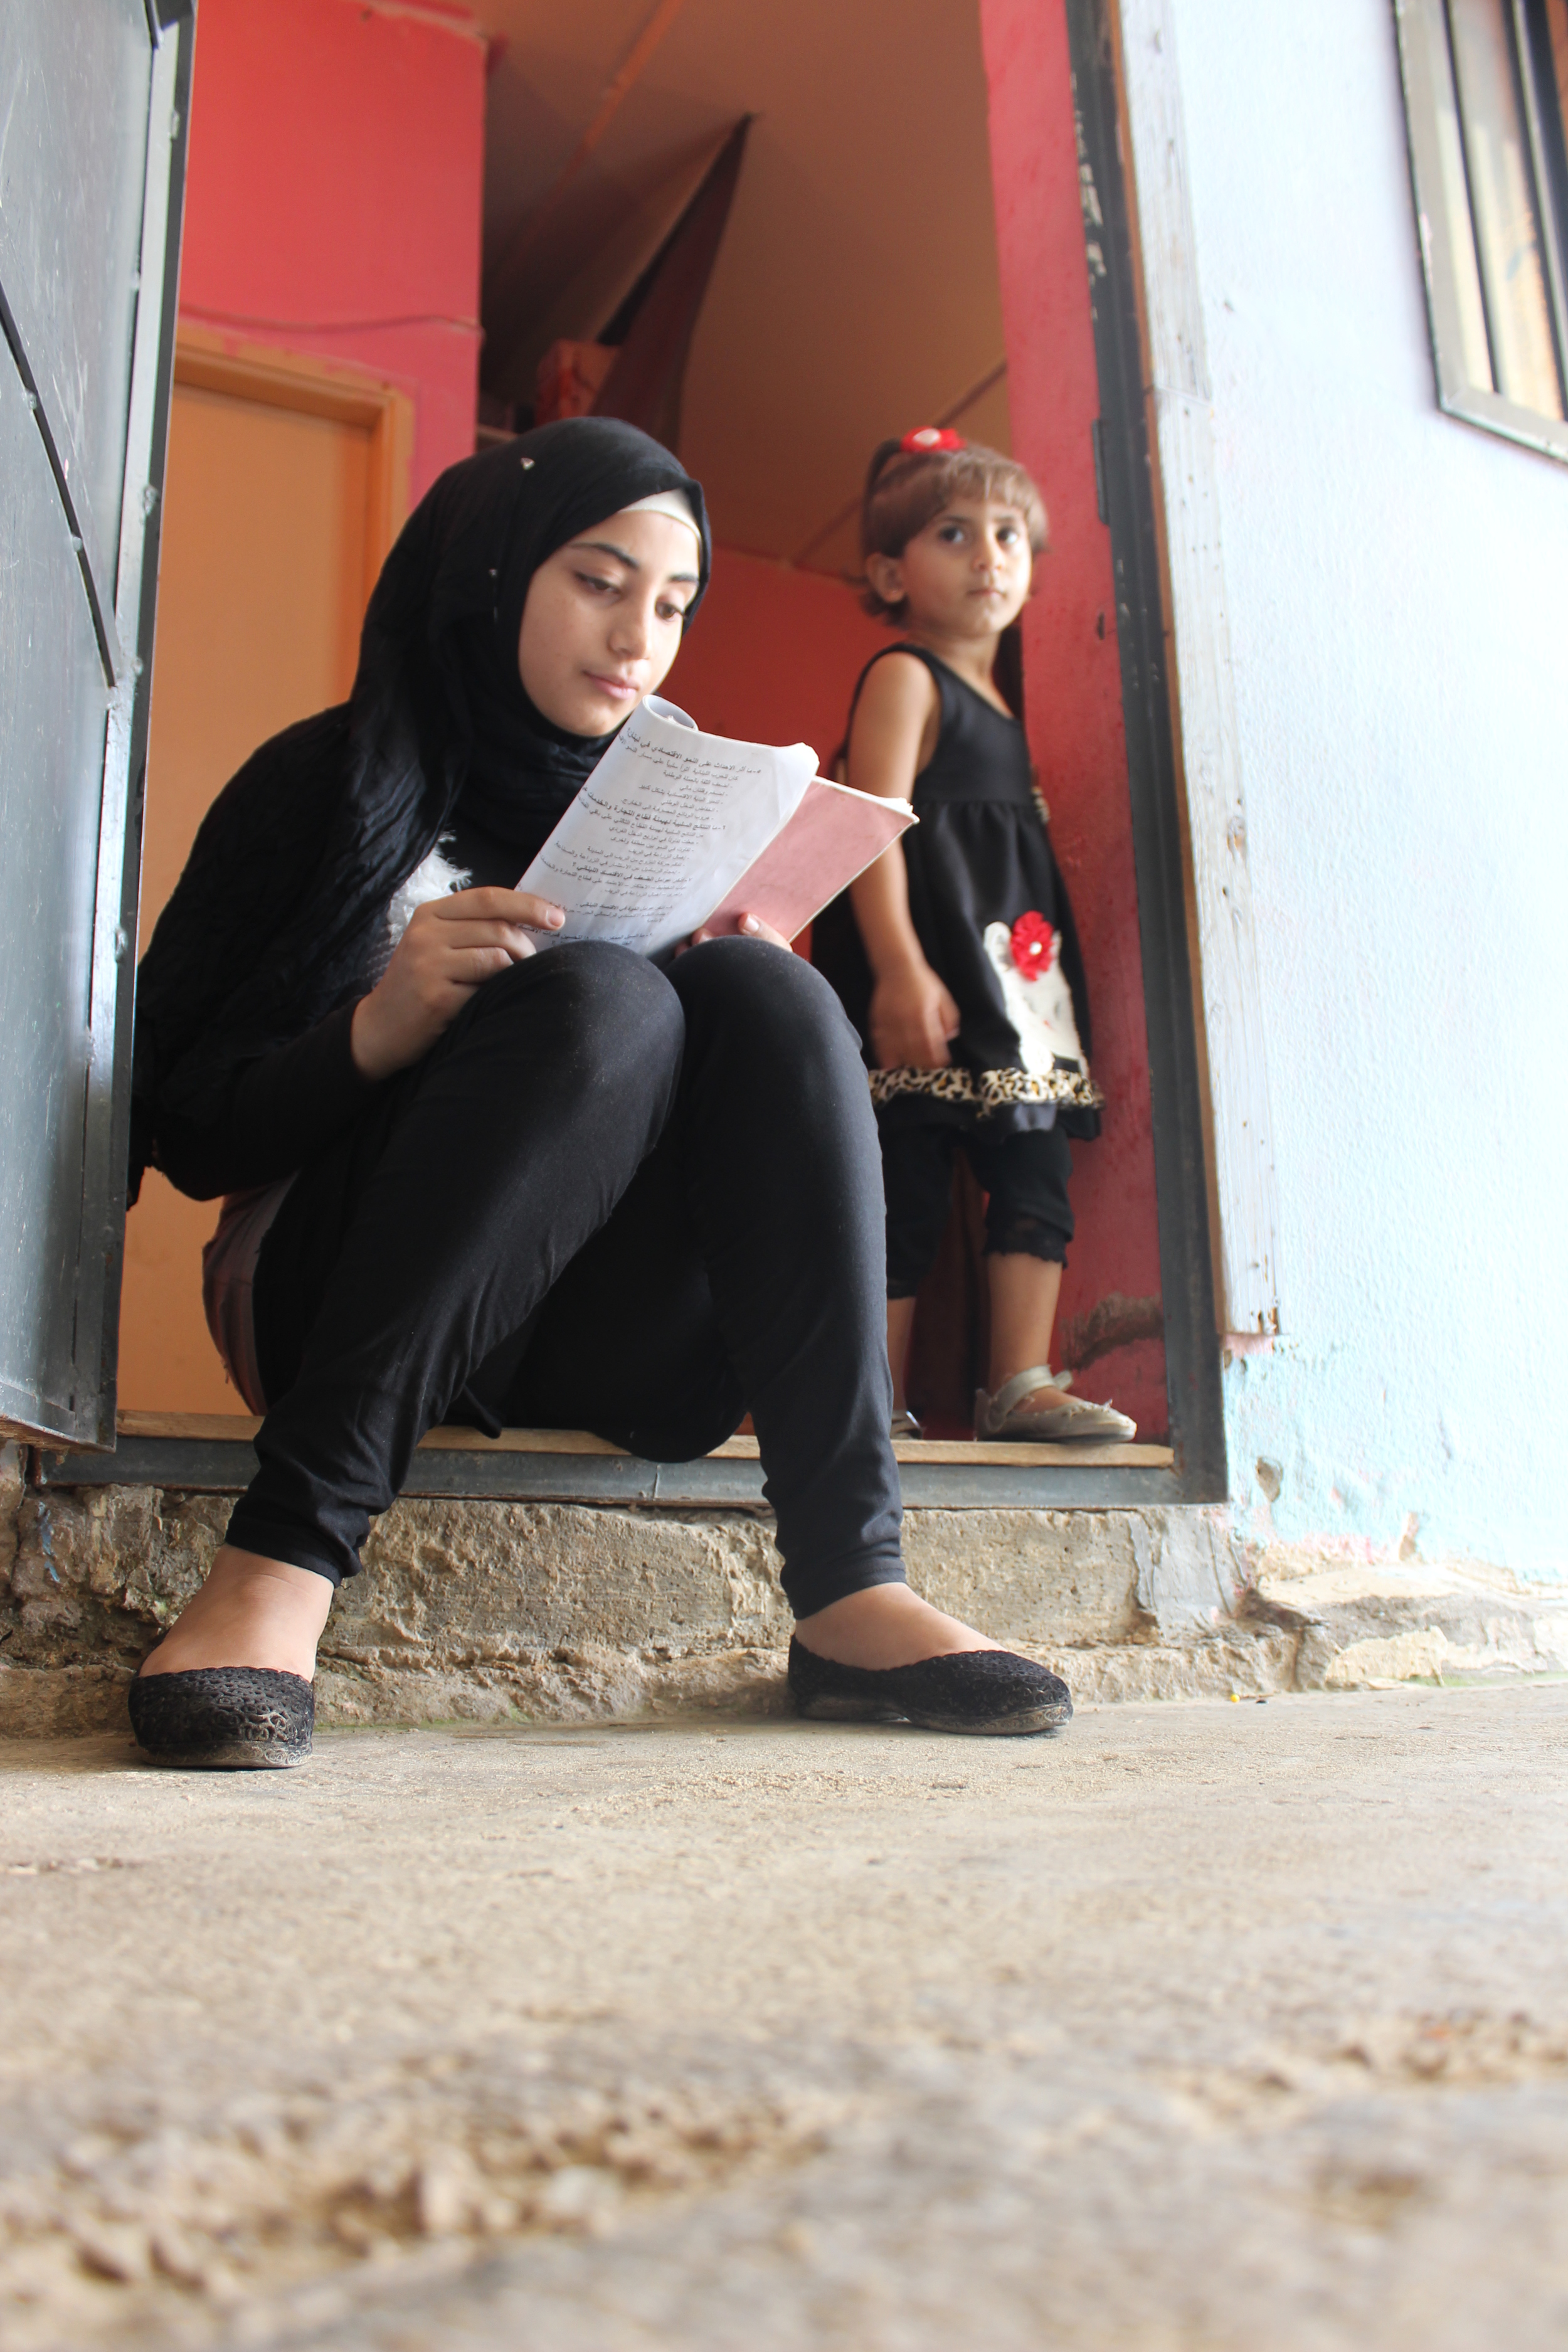 Meet Nour - Lebanon